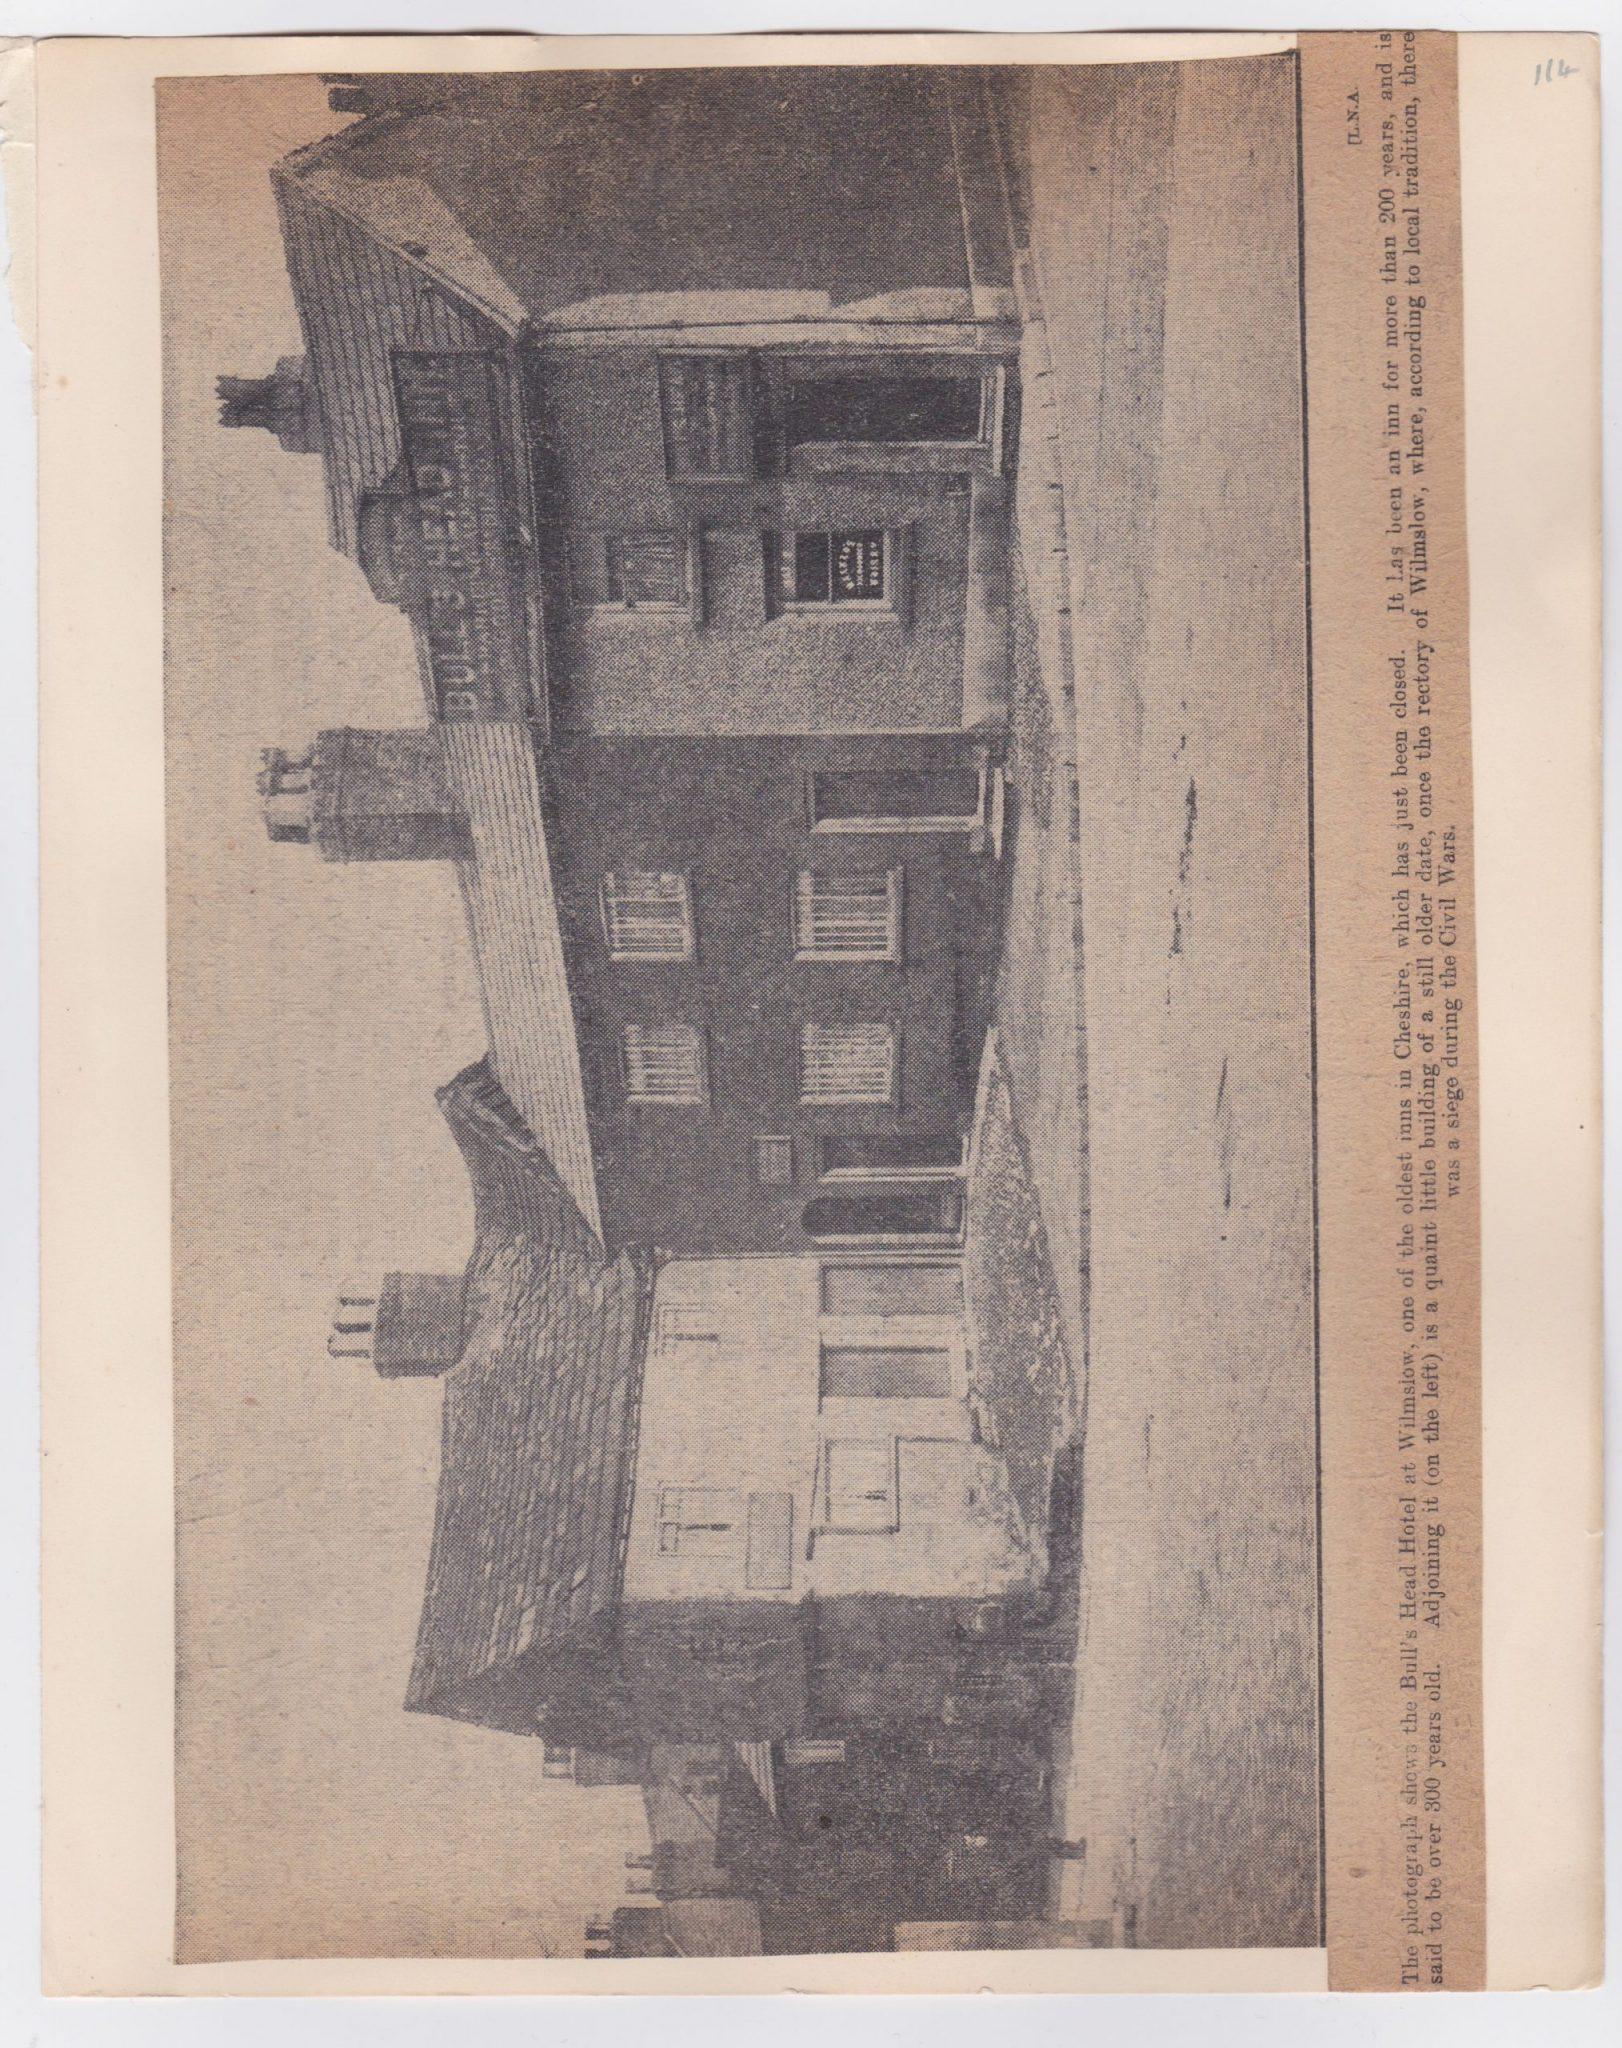 A Pub History Scrapbook Archive 50